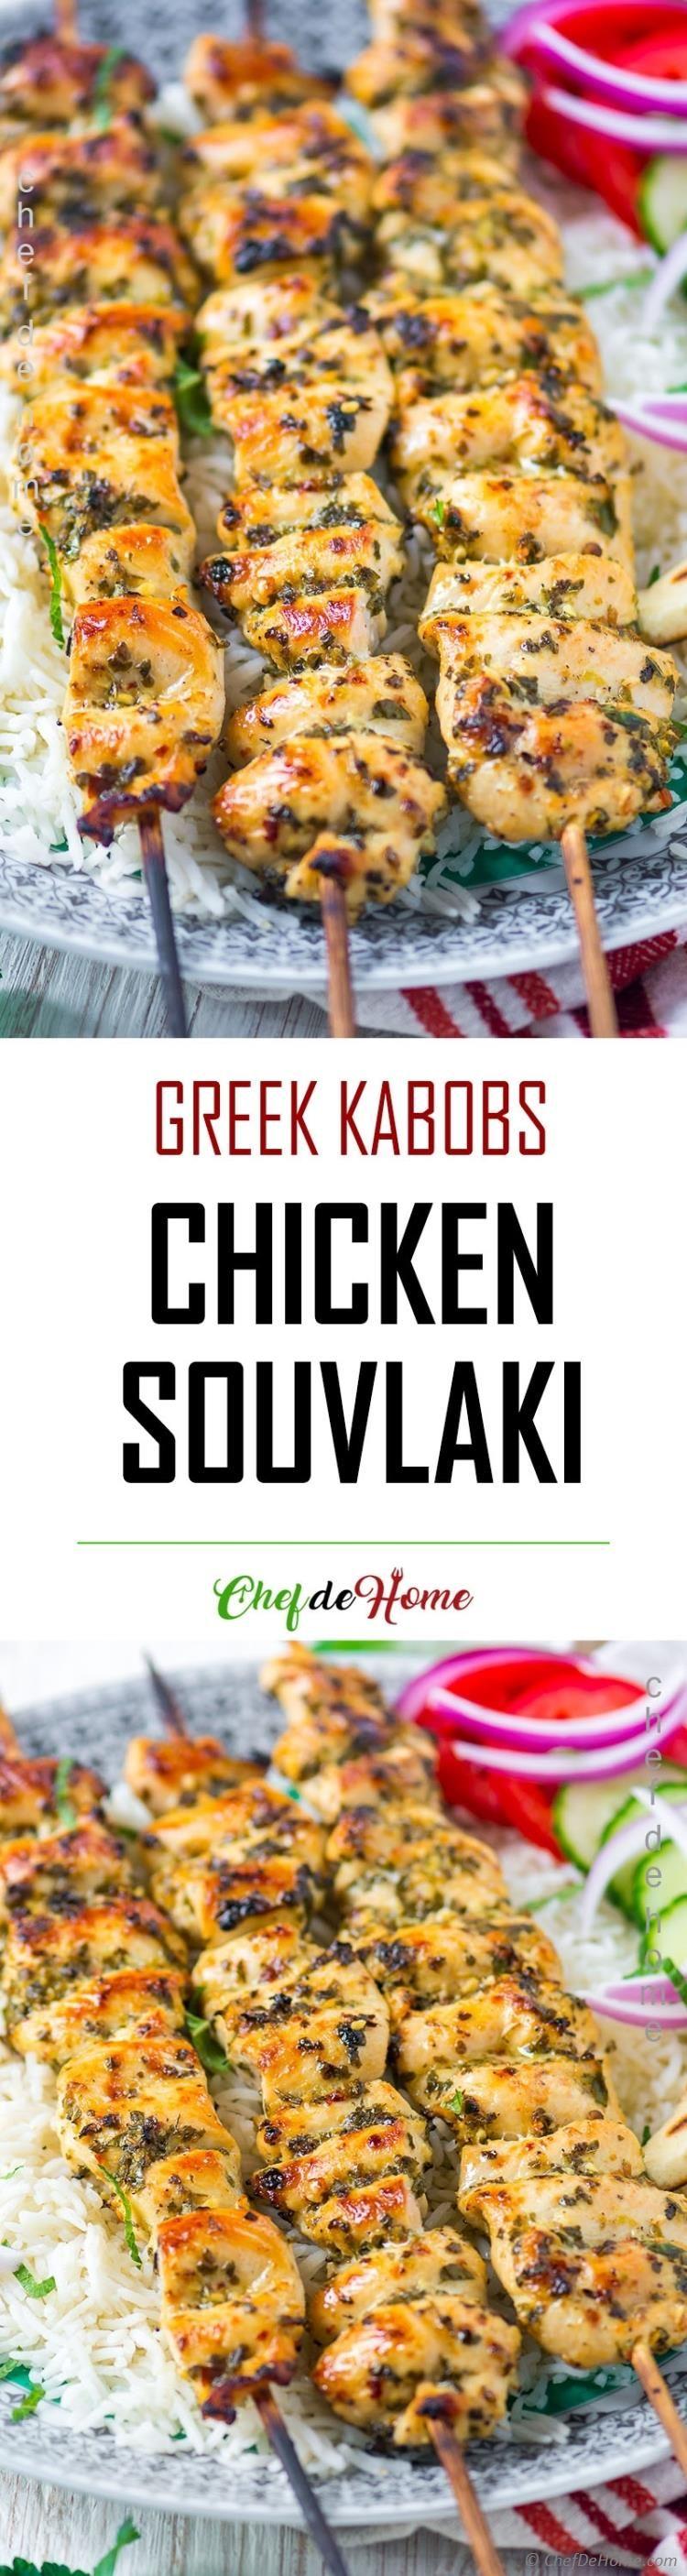 Chicken Souvlaki Kabobs recipe with rice and pita (Baking Chicken Healthy)